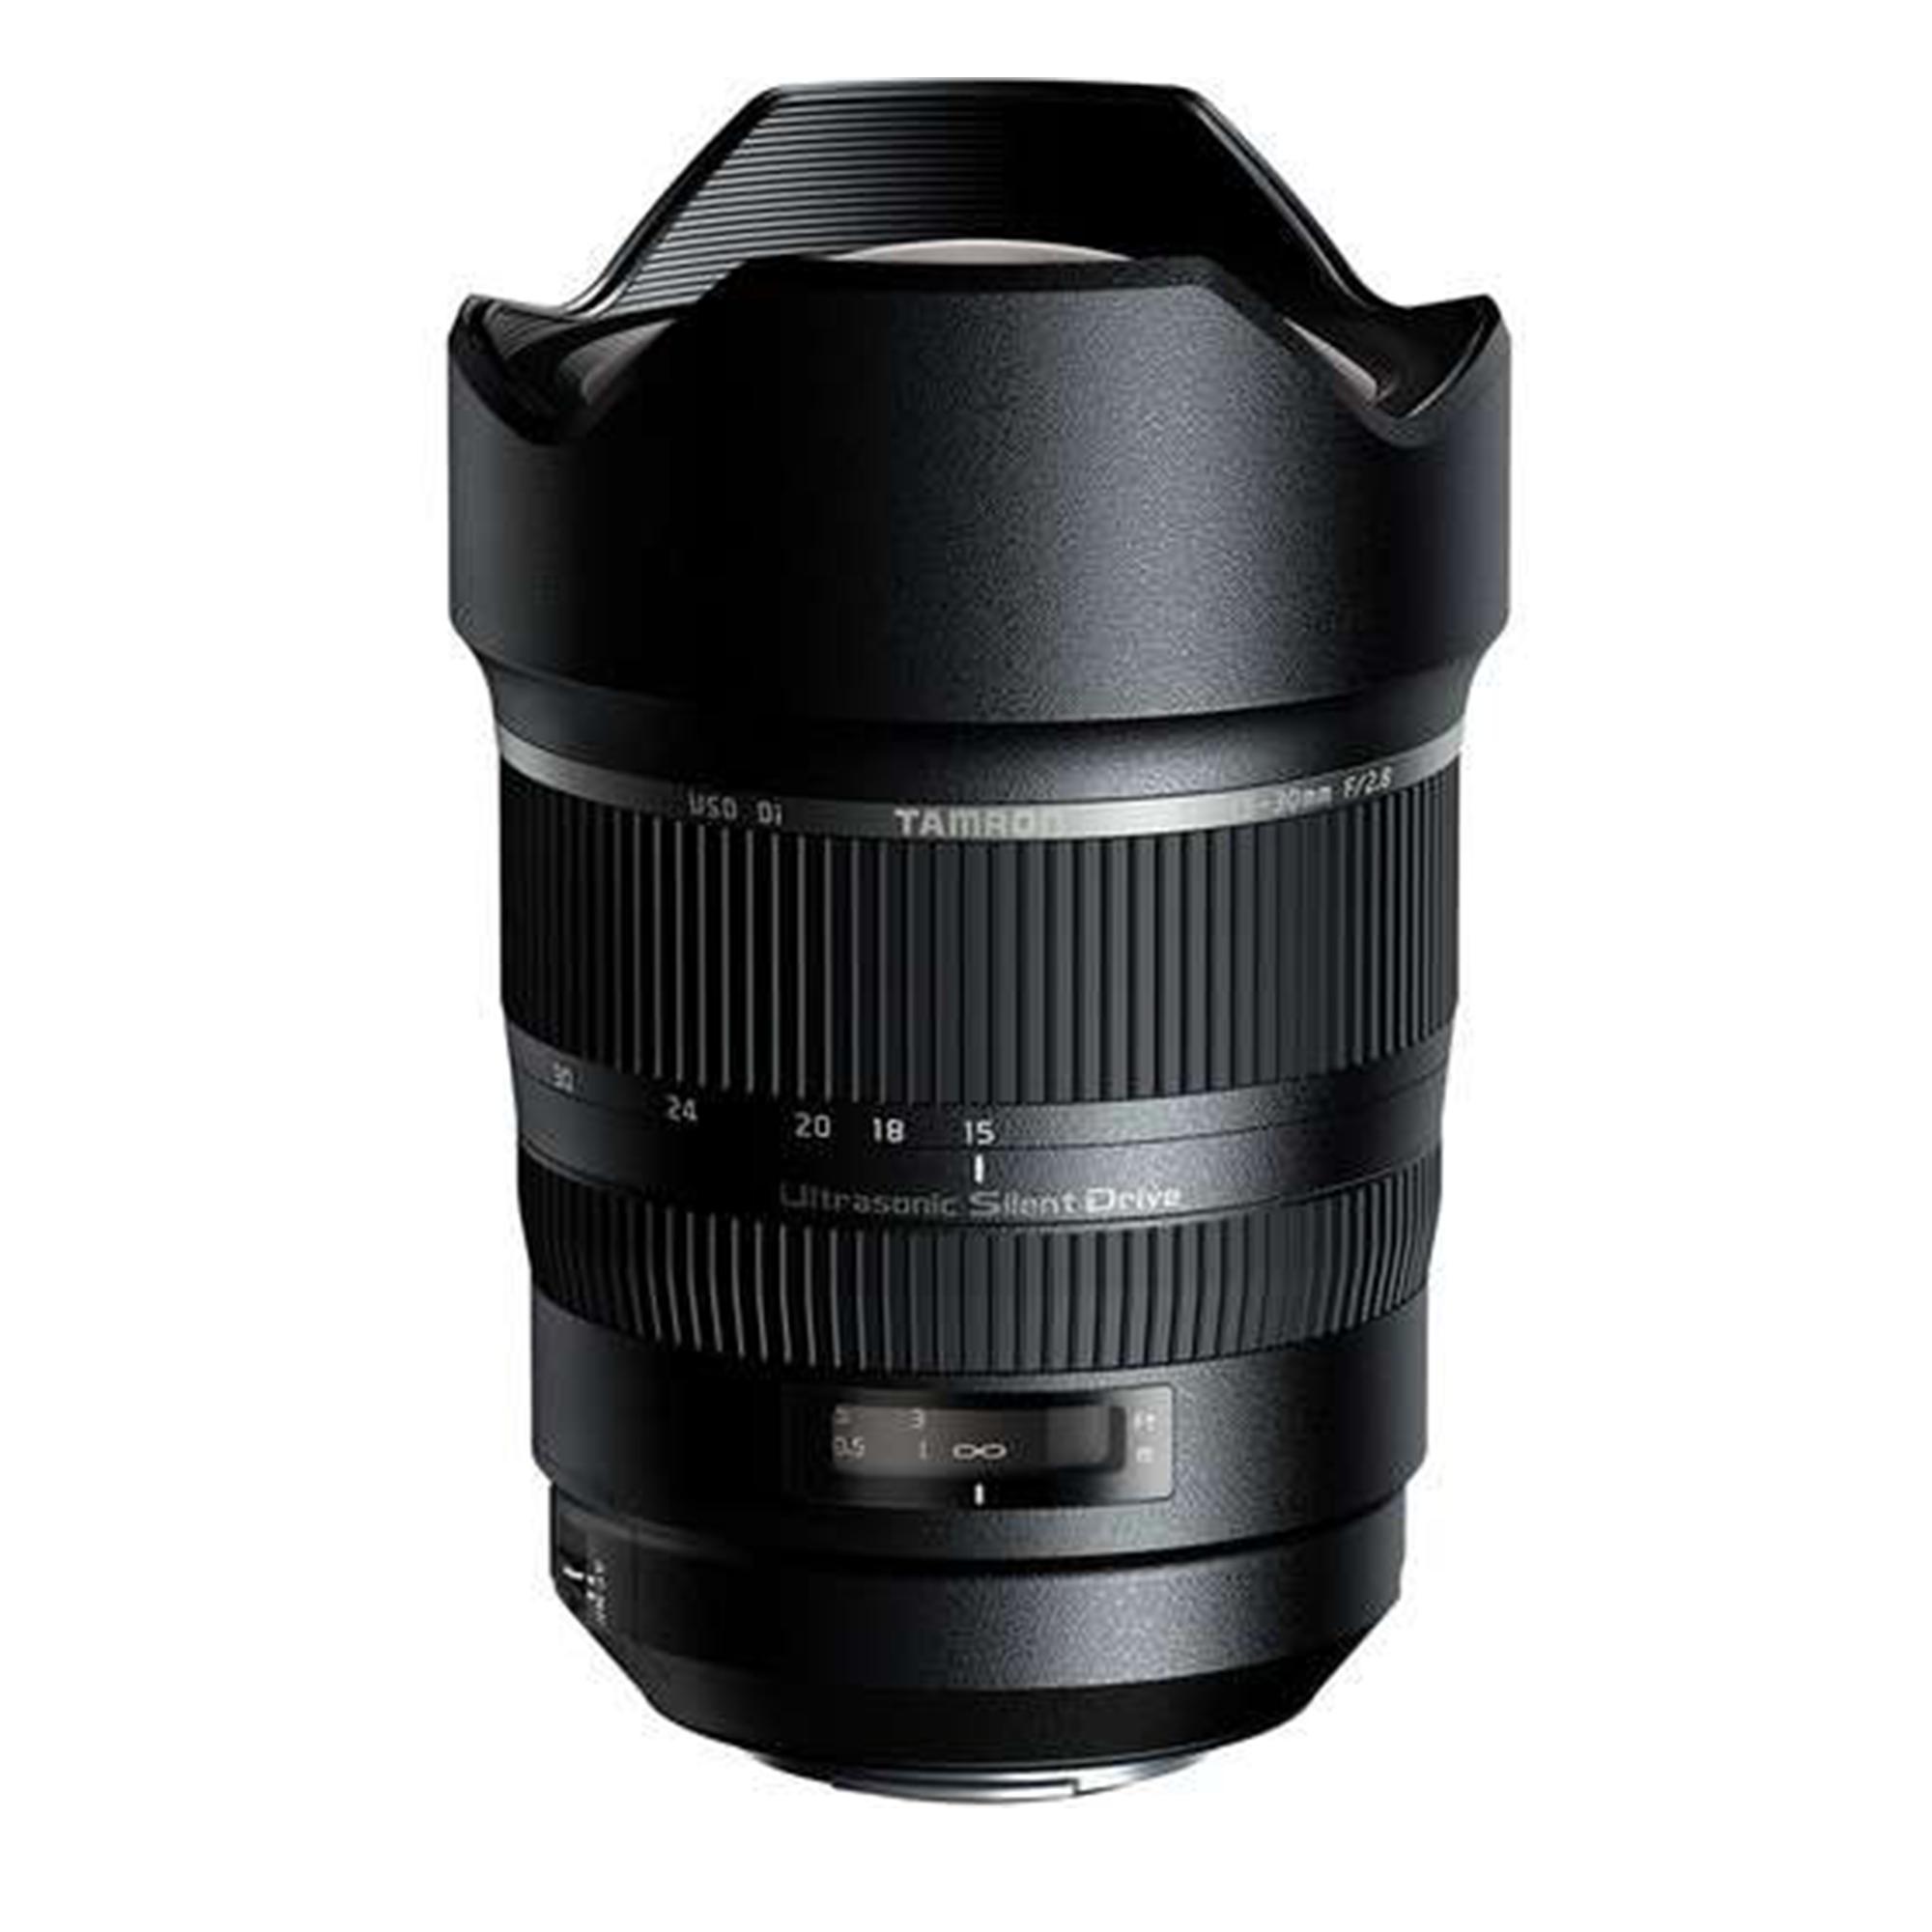 Tamron SP 15-30mm f / 2.8 Di VC USD Lens for Canon